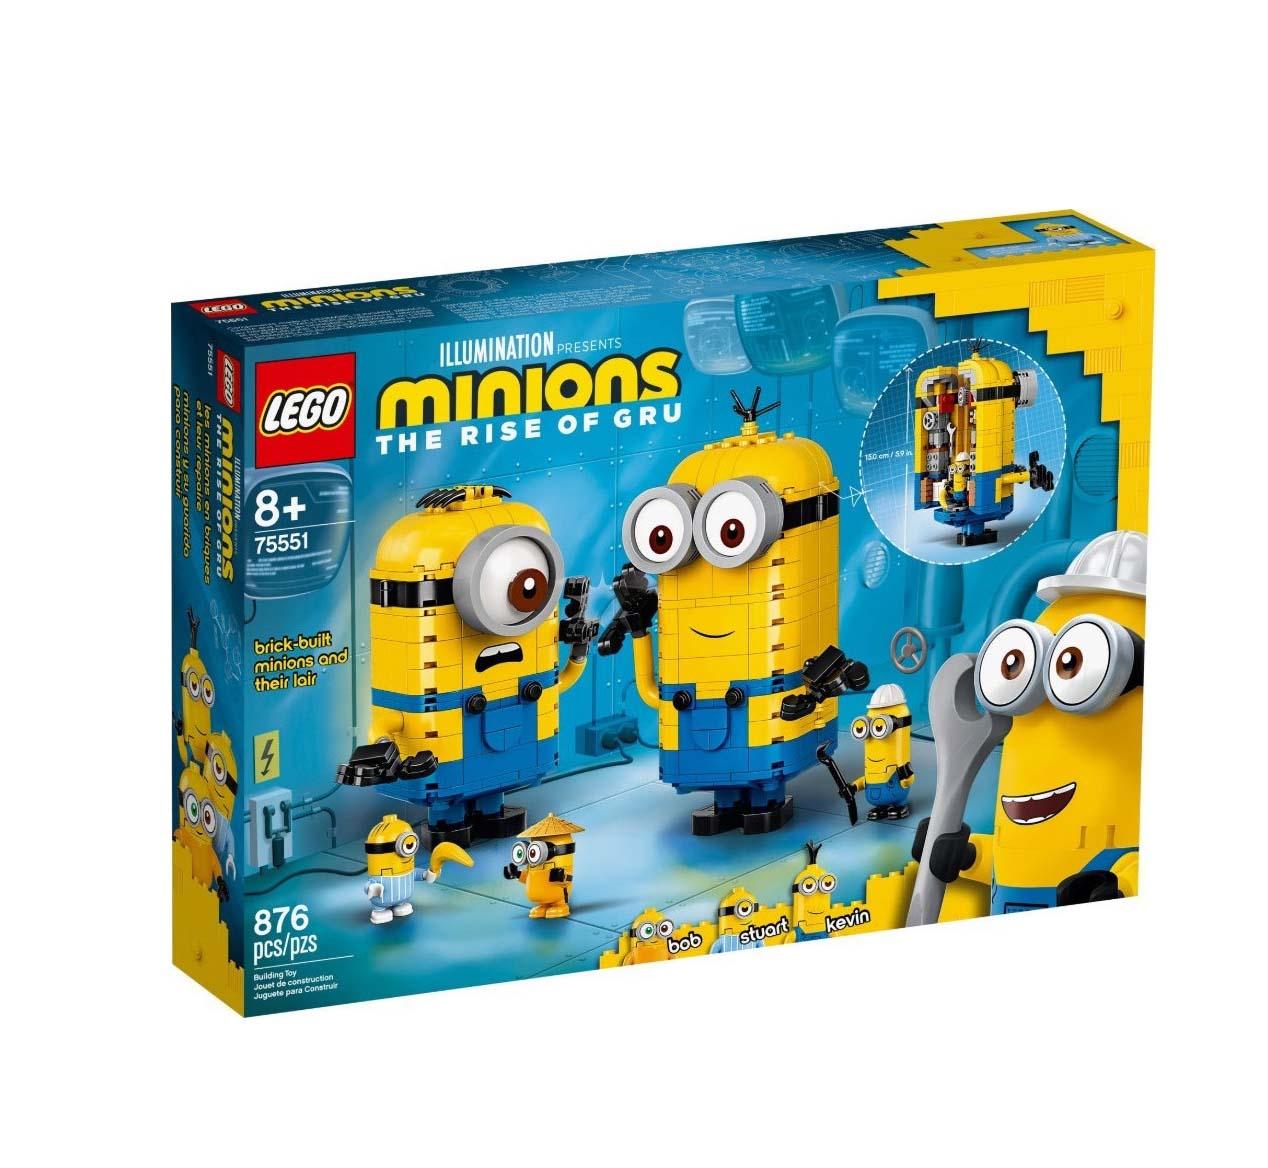 Lego Brick-built Minions and Their Lair 75551